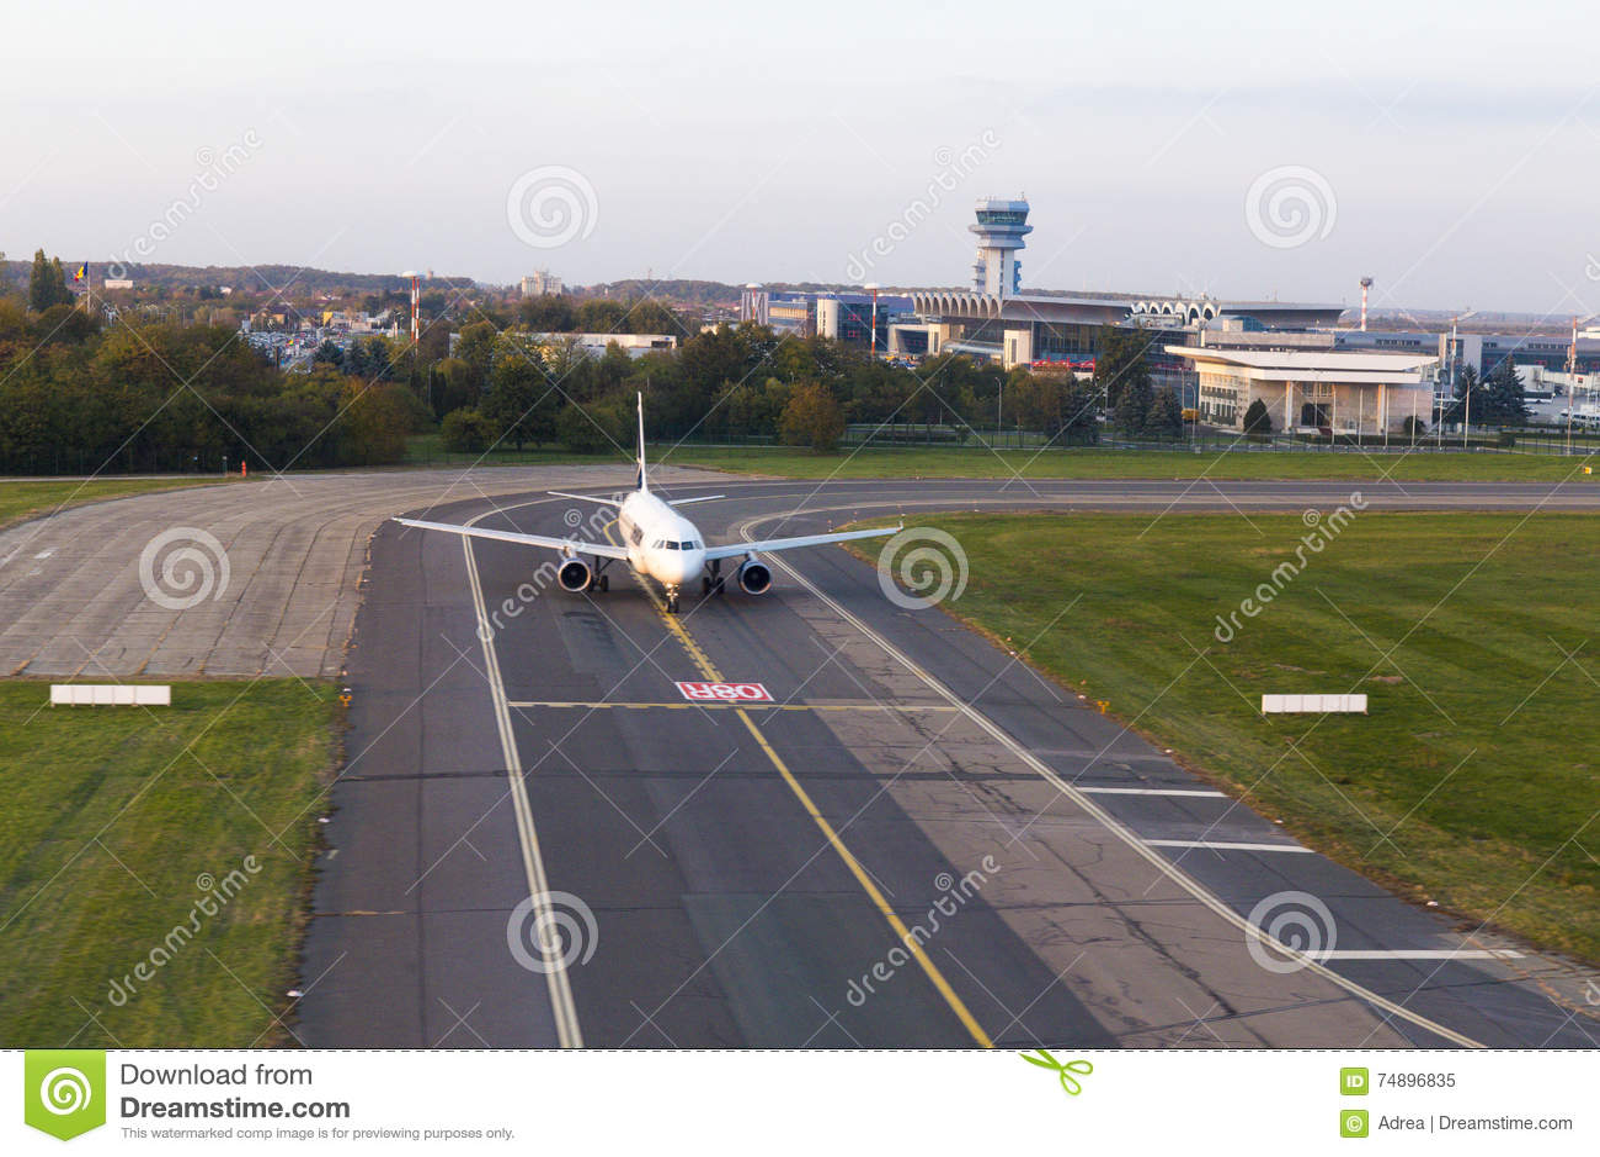 Catania airport stock image. Image of italy, main ...